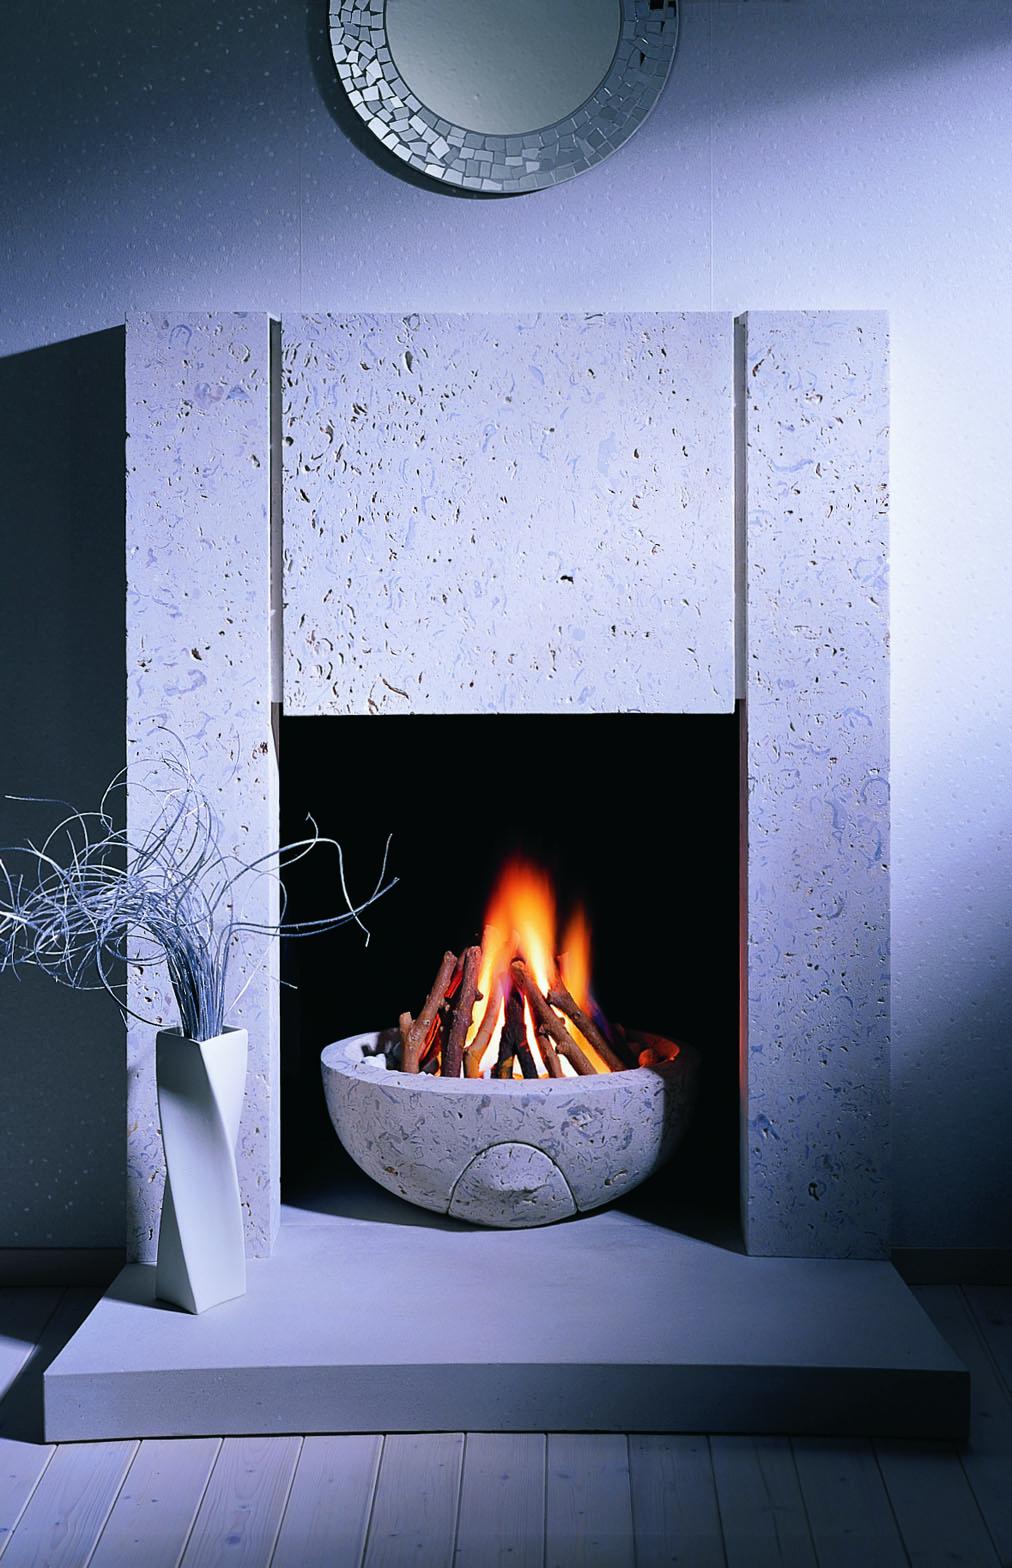 6. Portland Roach stone surround and firebowl – Highgate